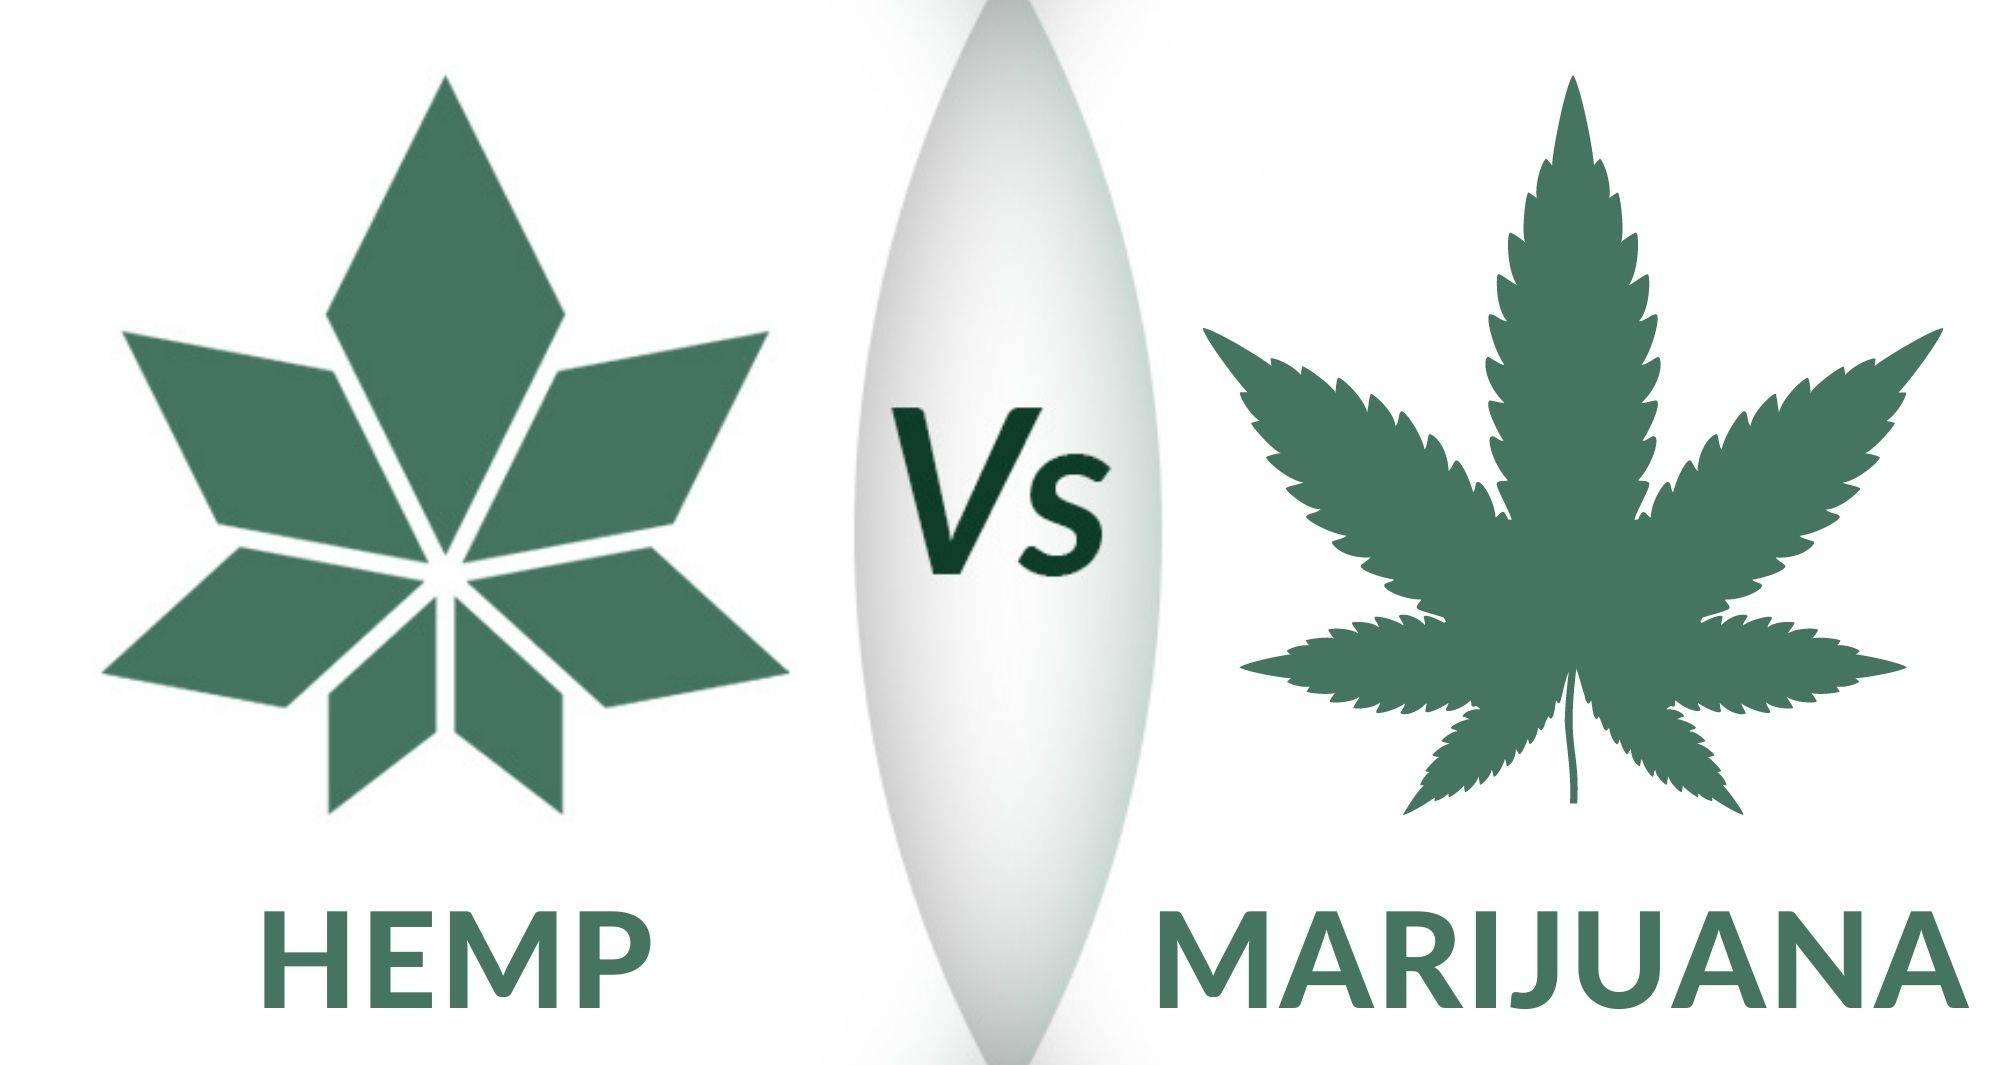 Hemp vs marijuana logo by WAMA Underwear